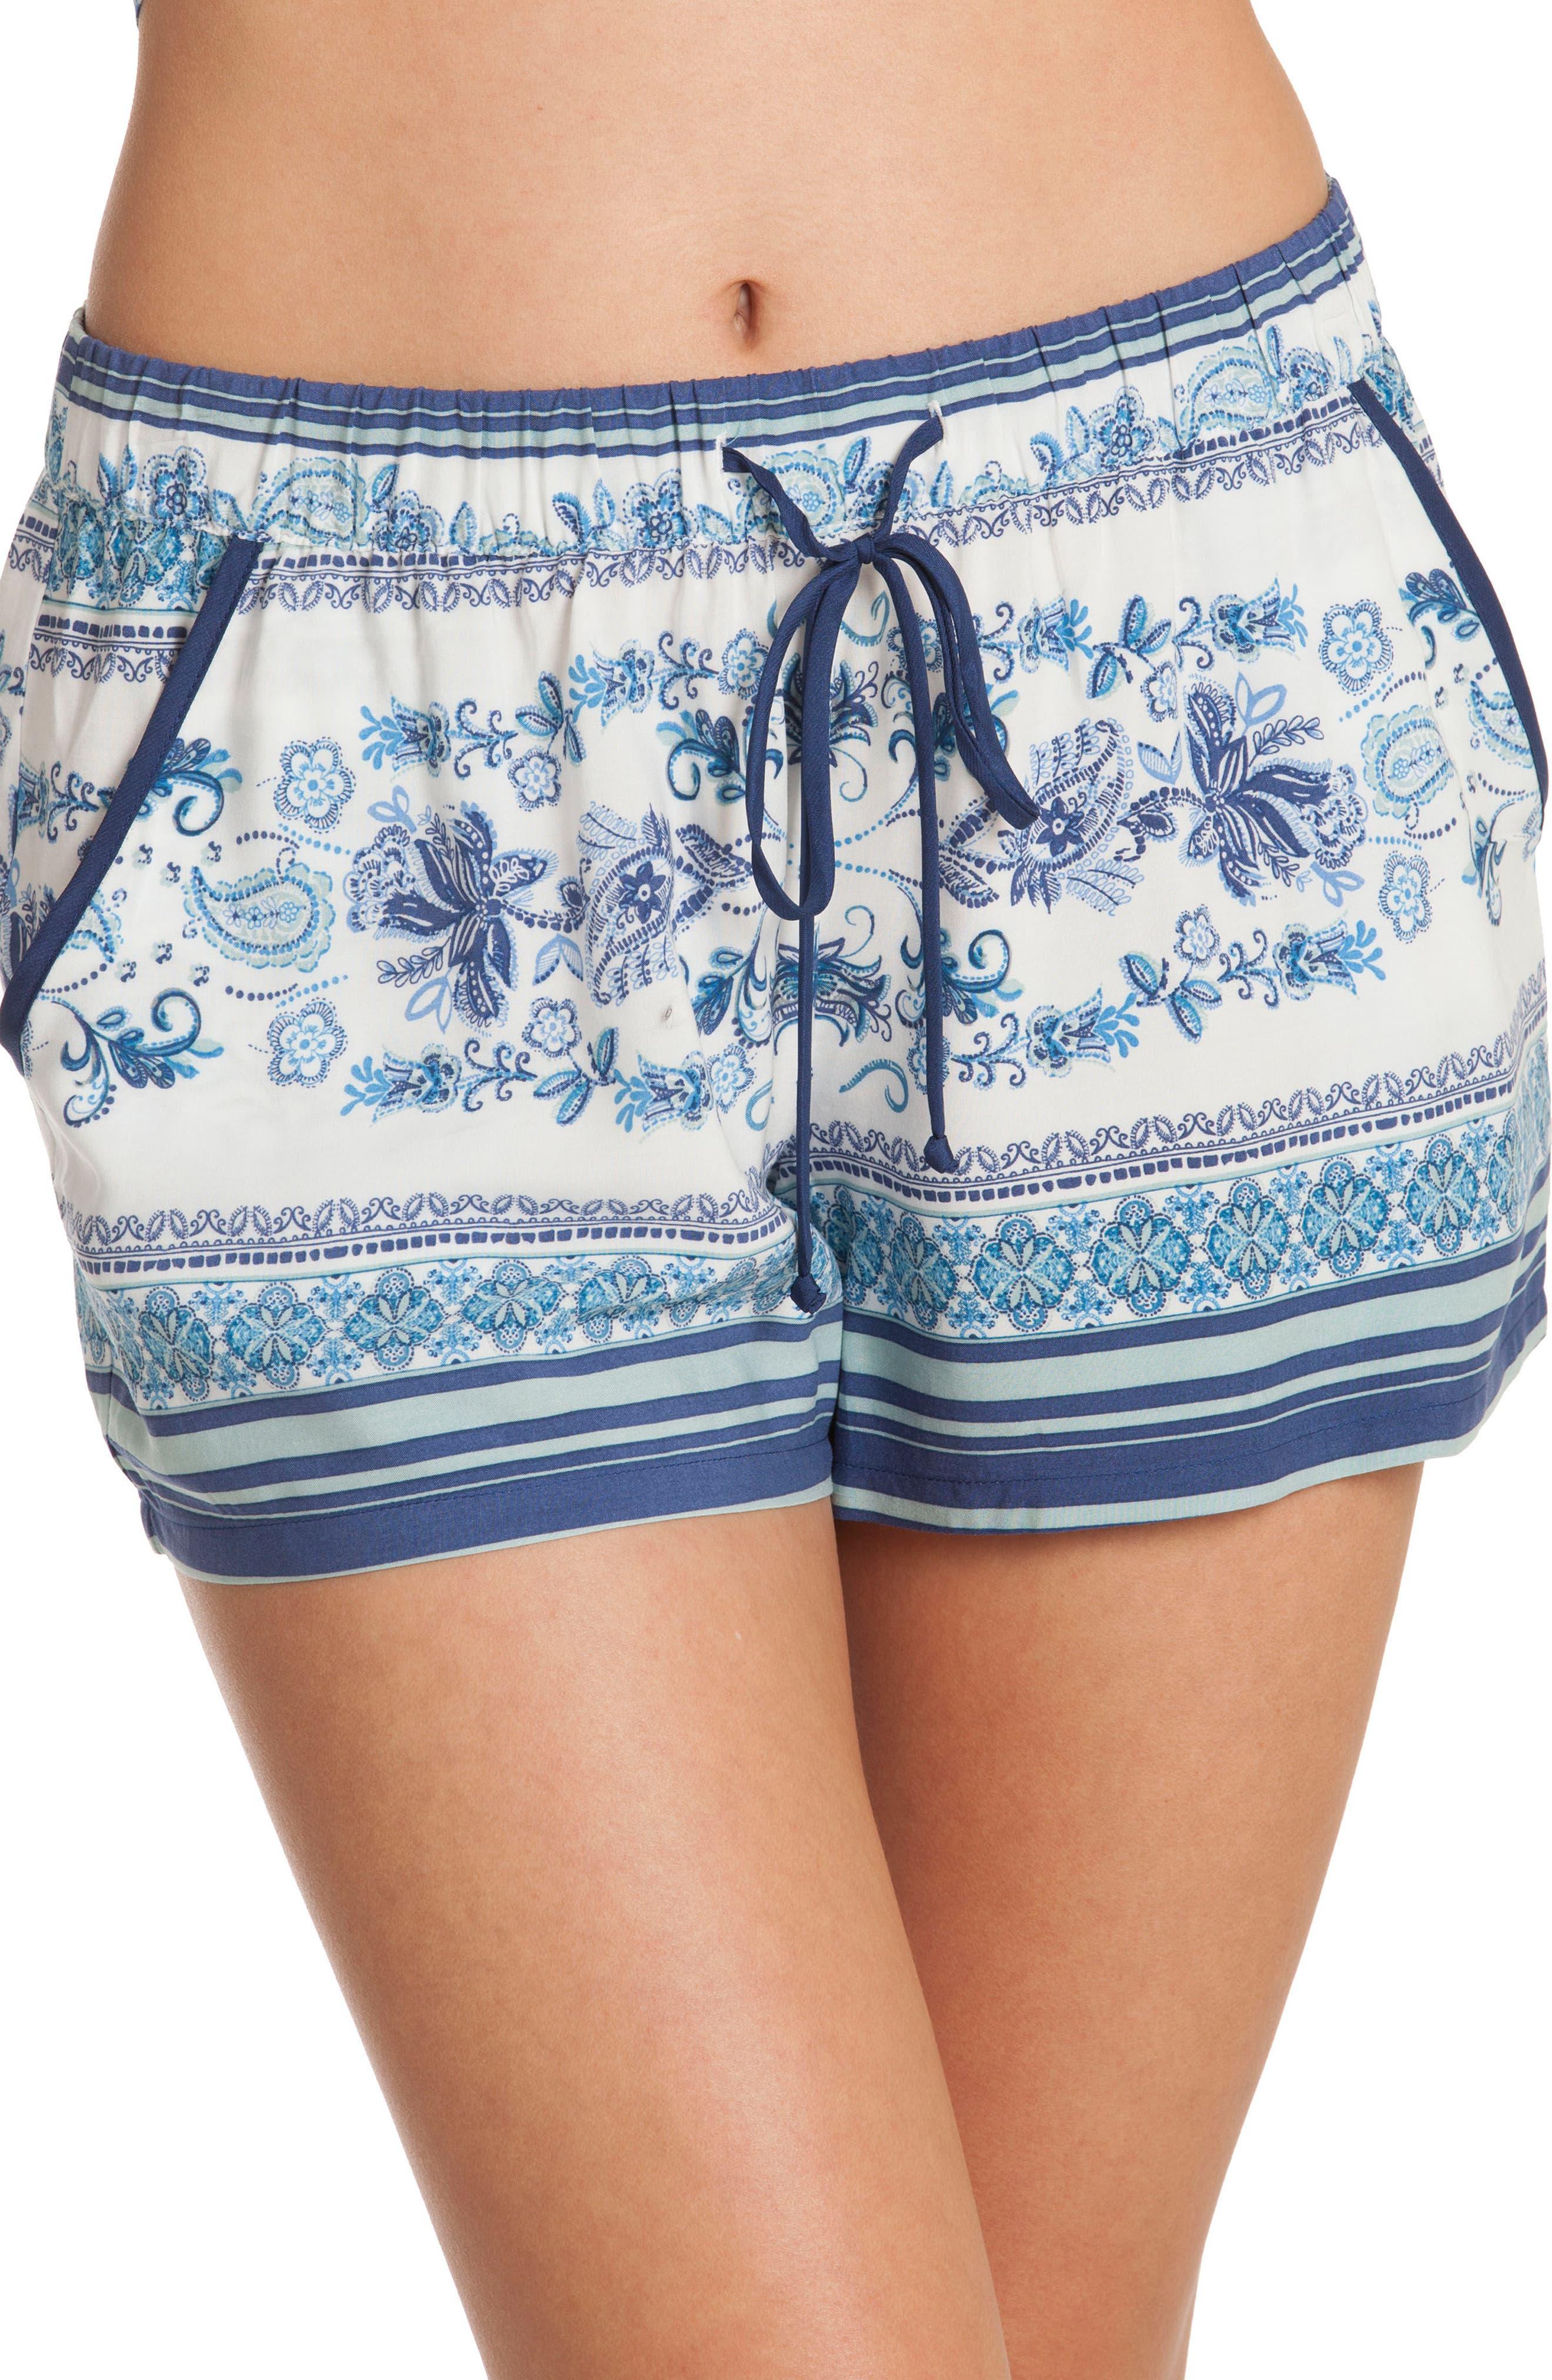 Short Pajamas,                             Alternate thumbnail 4, color,                             437